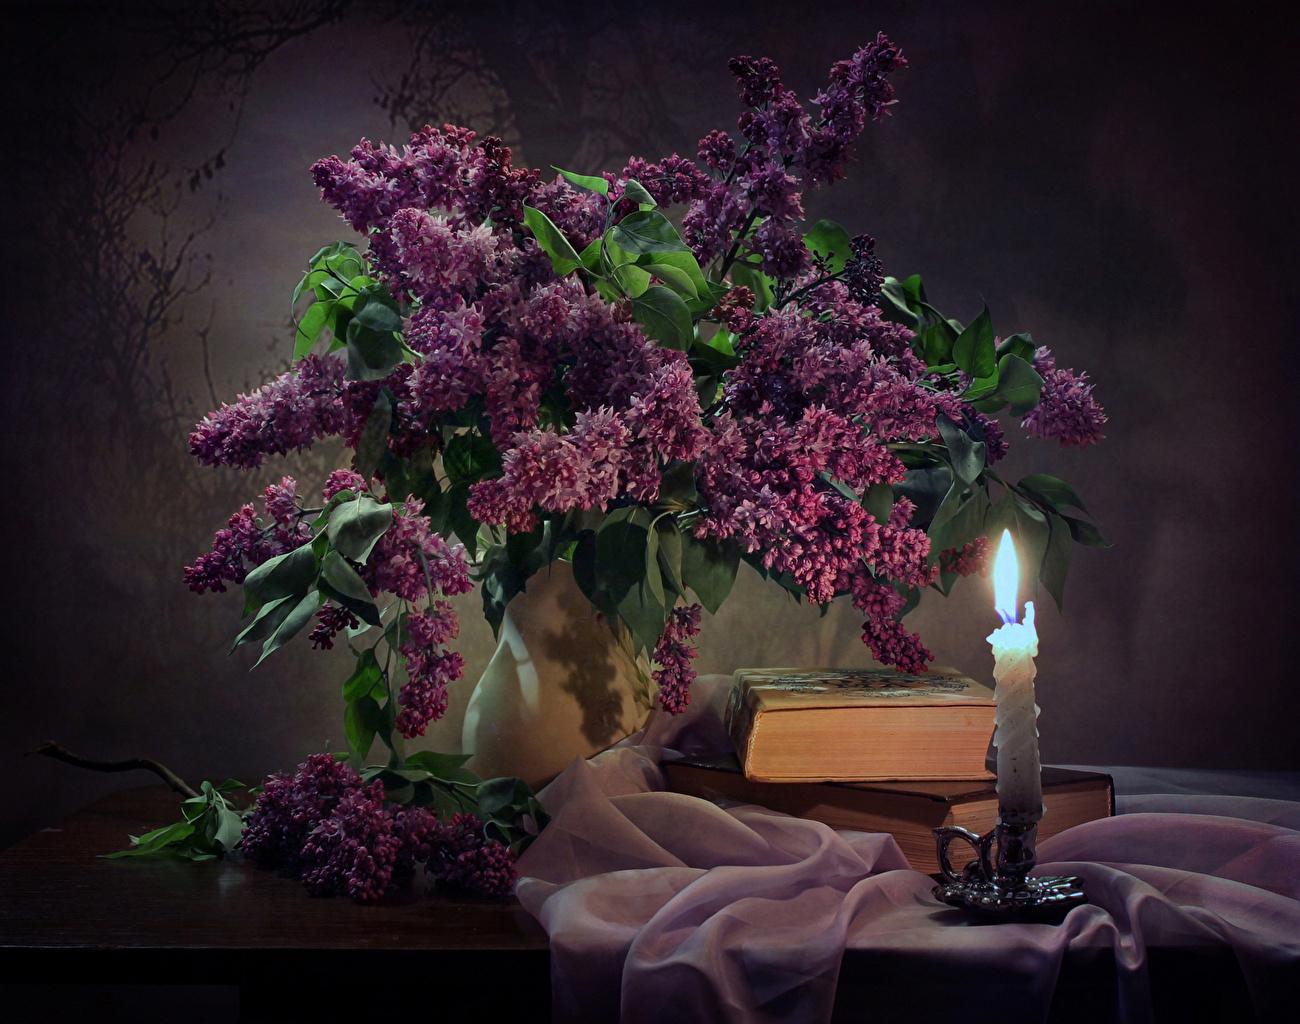 Картинки Цветы Сирень Стол вазы Свечи Книга Натюрморт цветок вазе Ваза столы книги стола